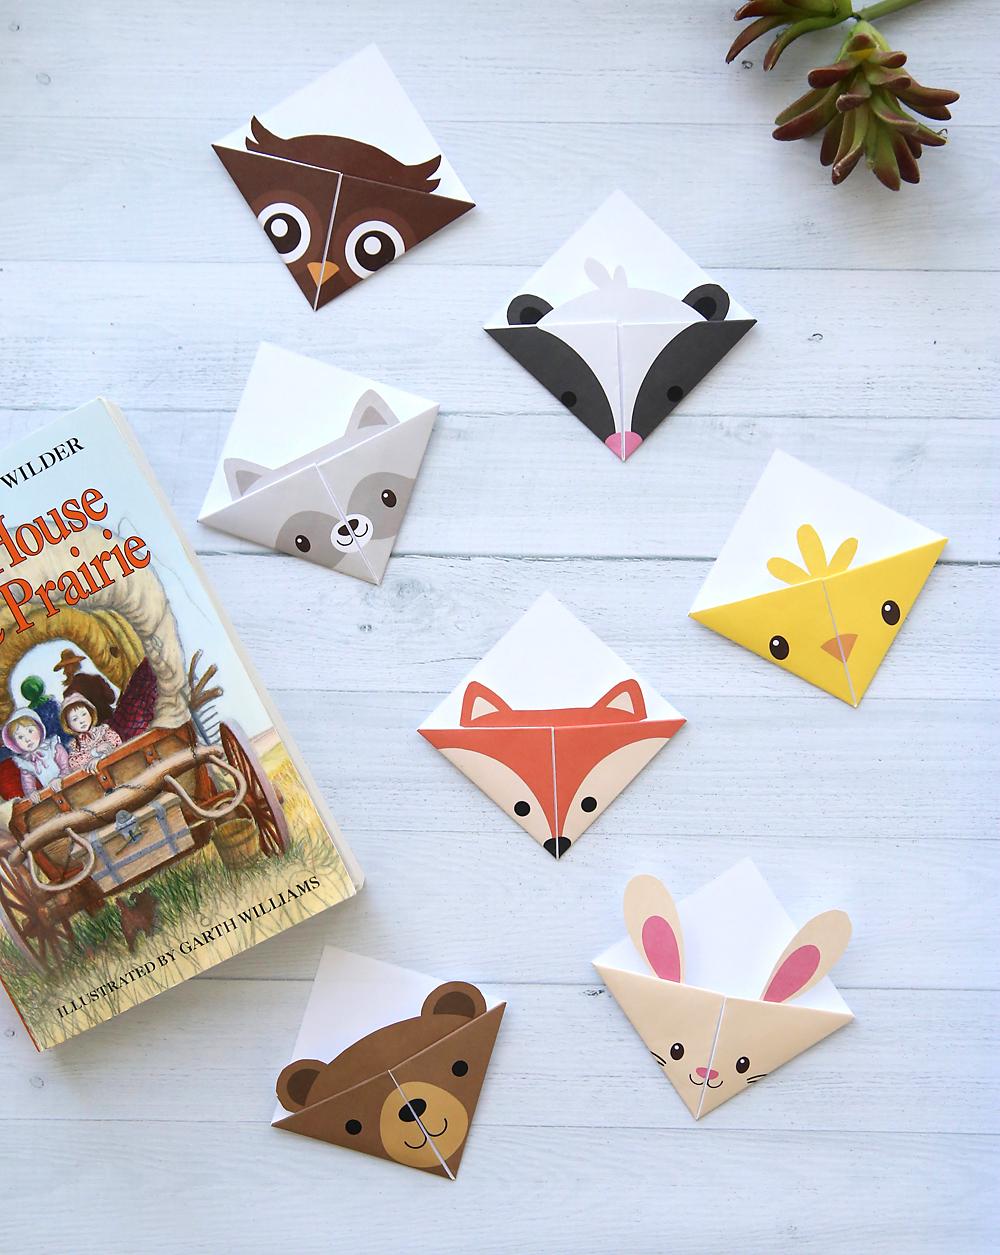 Diy Woodland Animals Origami Bookmarks {Print + Fold} - It's Always - Free Printable Owl Bookmarks